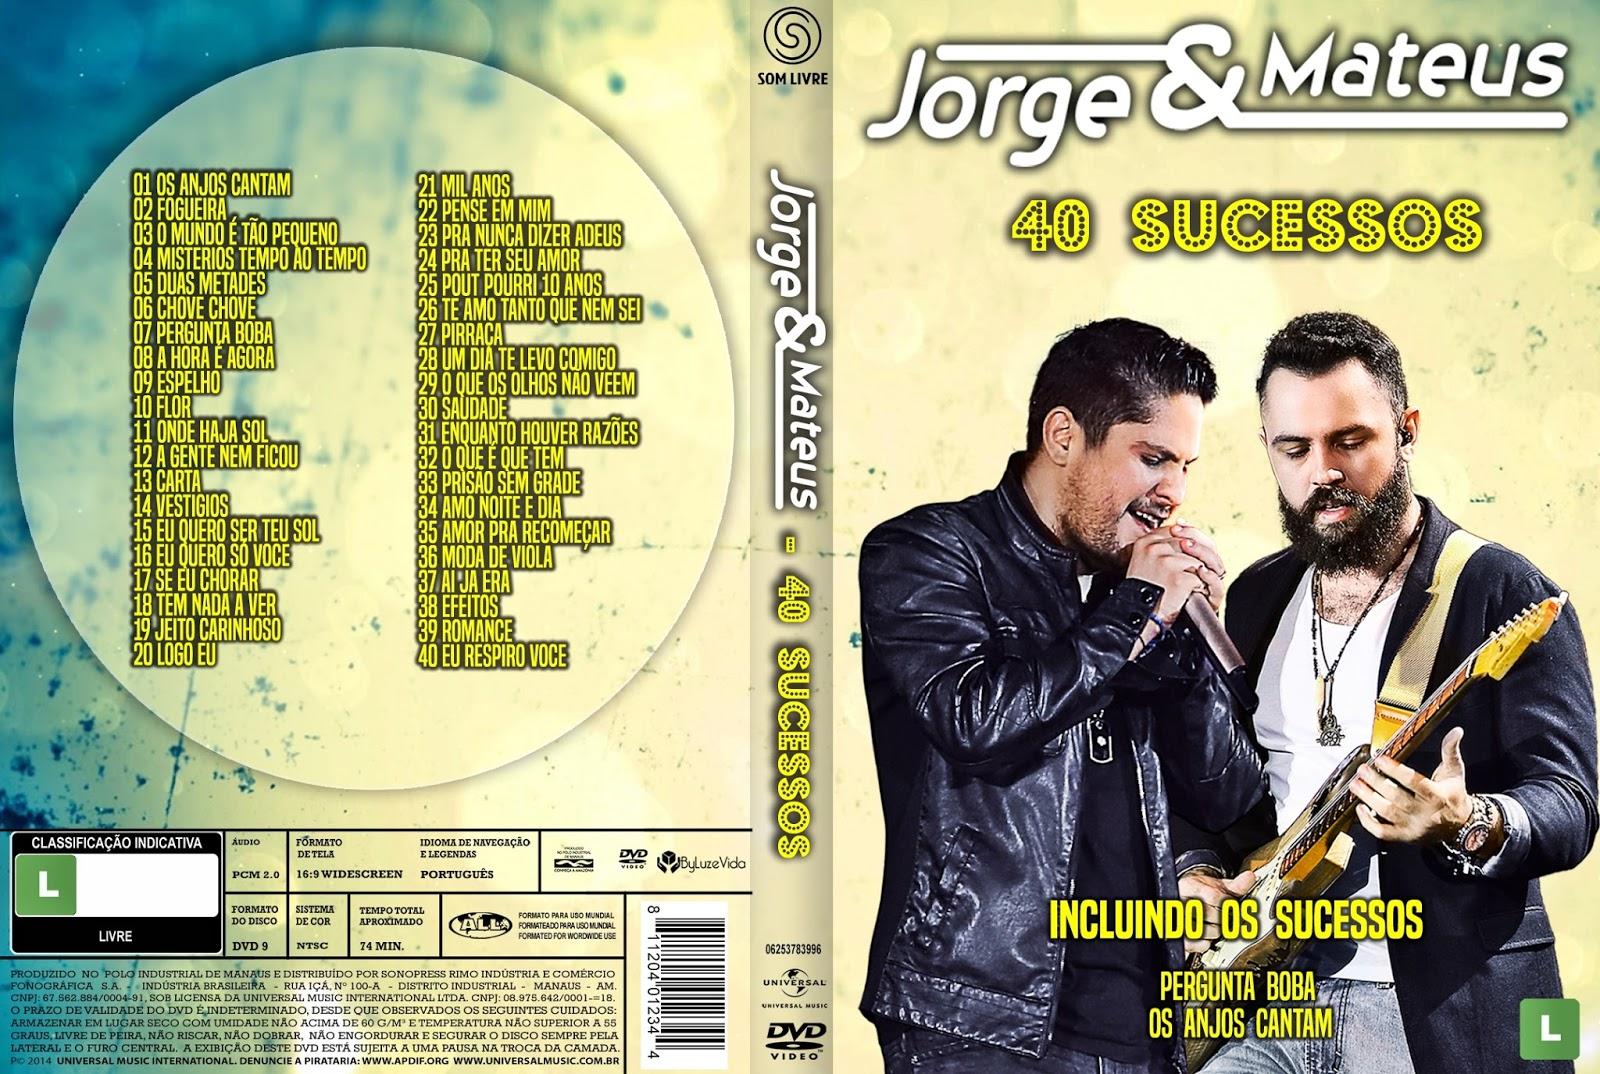 Download Jorge & Mateus 40 Sucessos DVD-R Jorge 2B 2526 2BMateus 2B40 2BSucessos 2BDVD R 2BXANDAODOWNLOAD